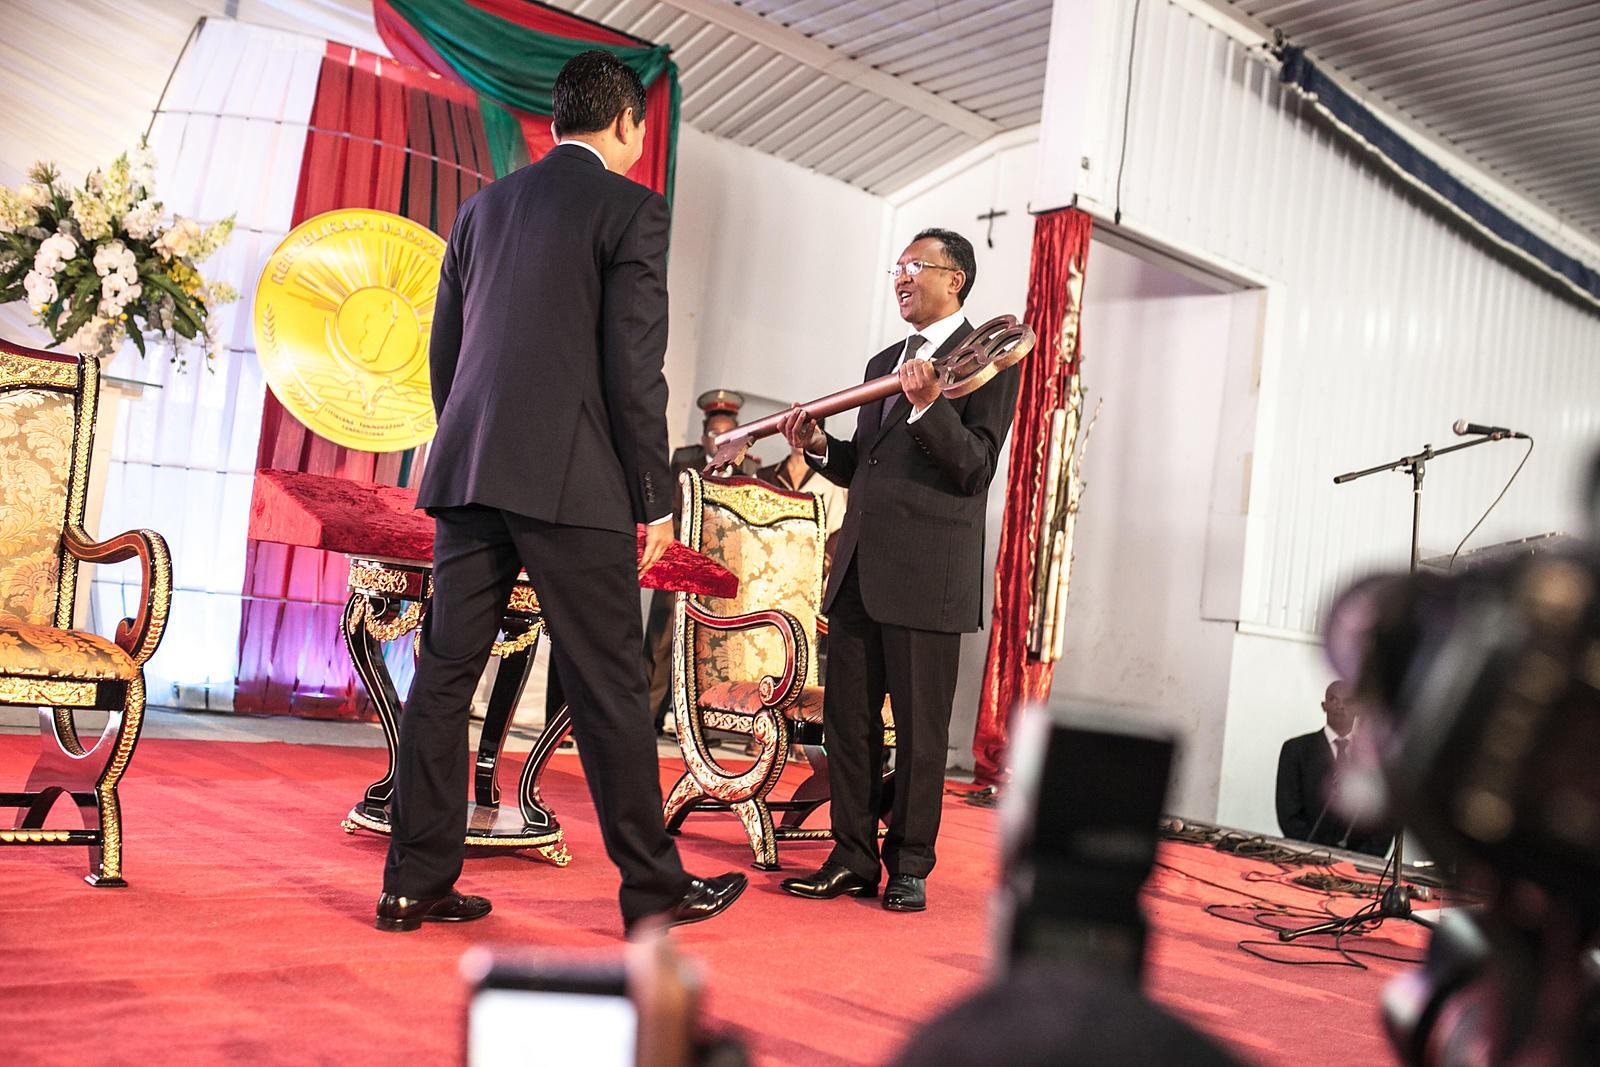 RIJASOLO | Madagascar's newly elected President Hery